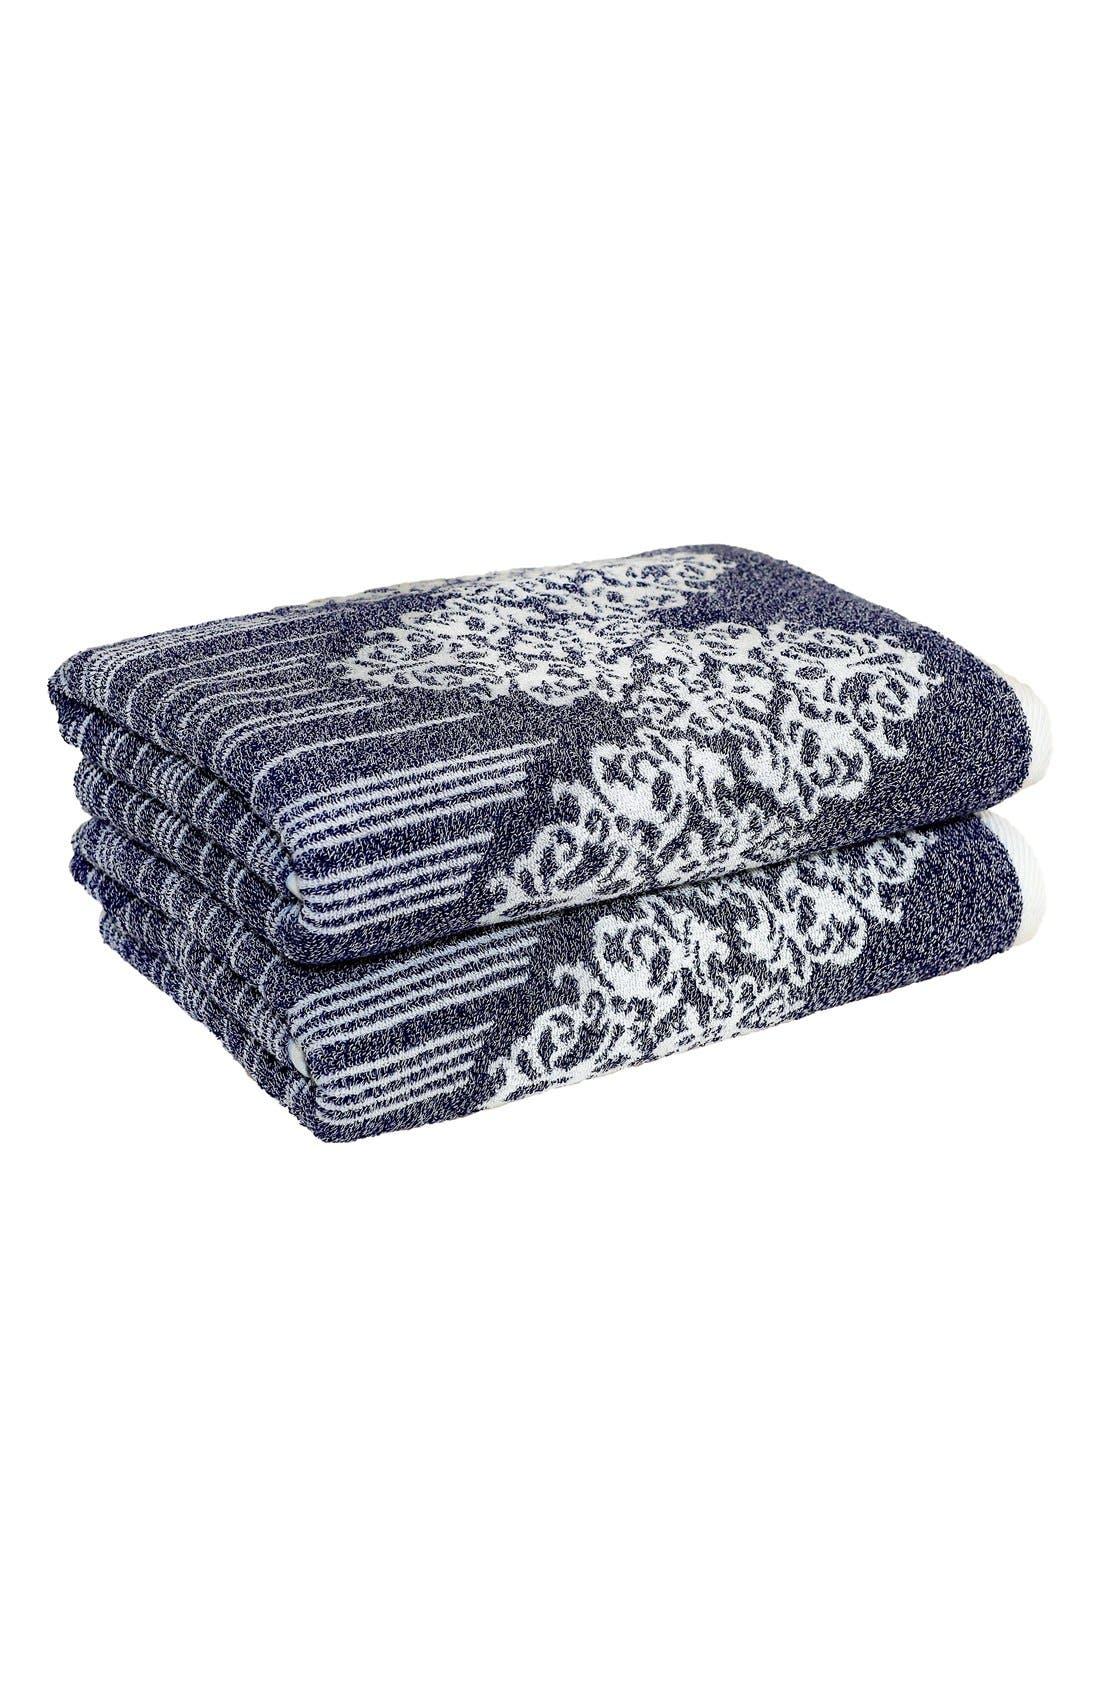 Alternate Image 1 Selected - Linum 'Gioia' Turkish Cotton Bath Towels (Set of 2)